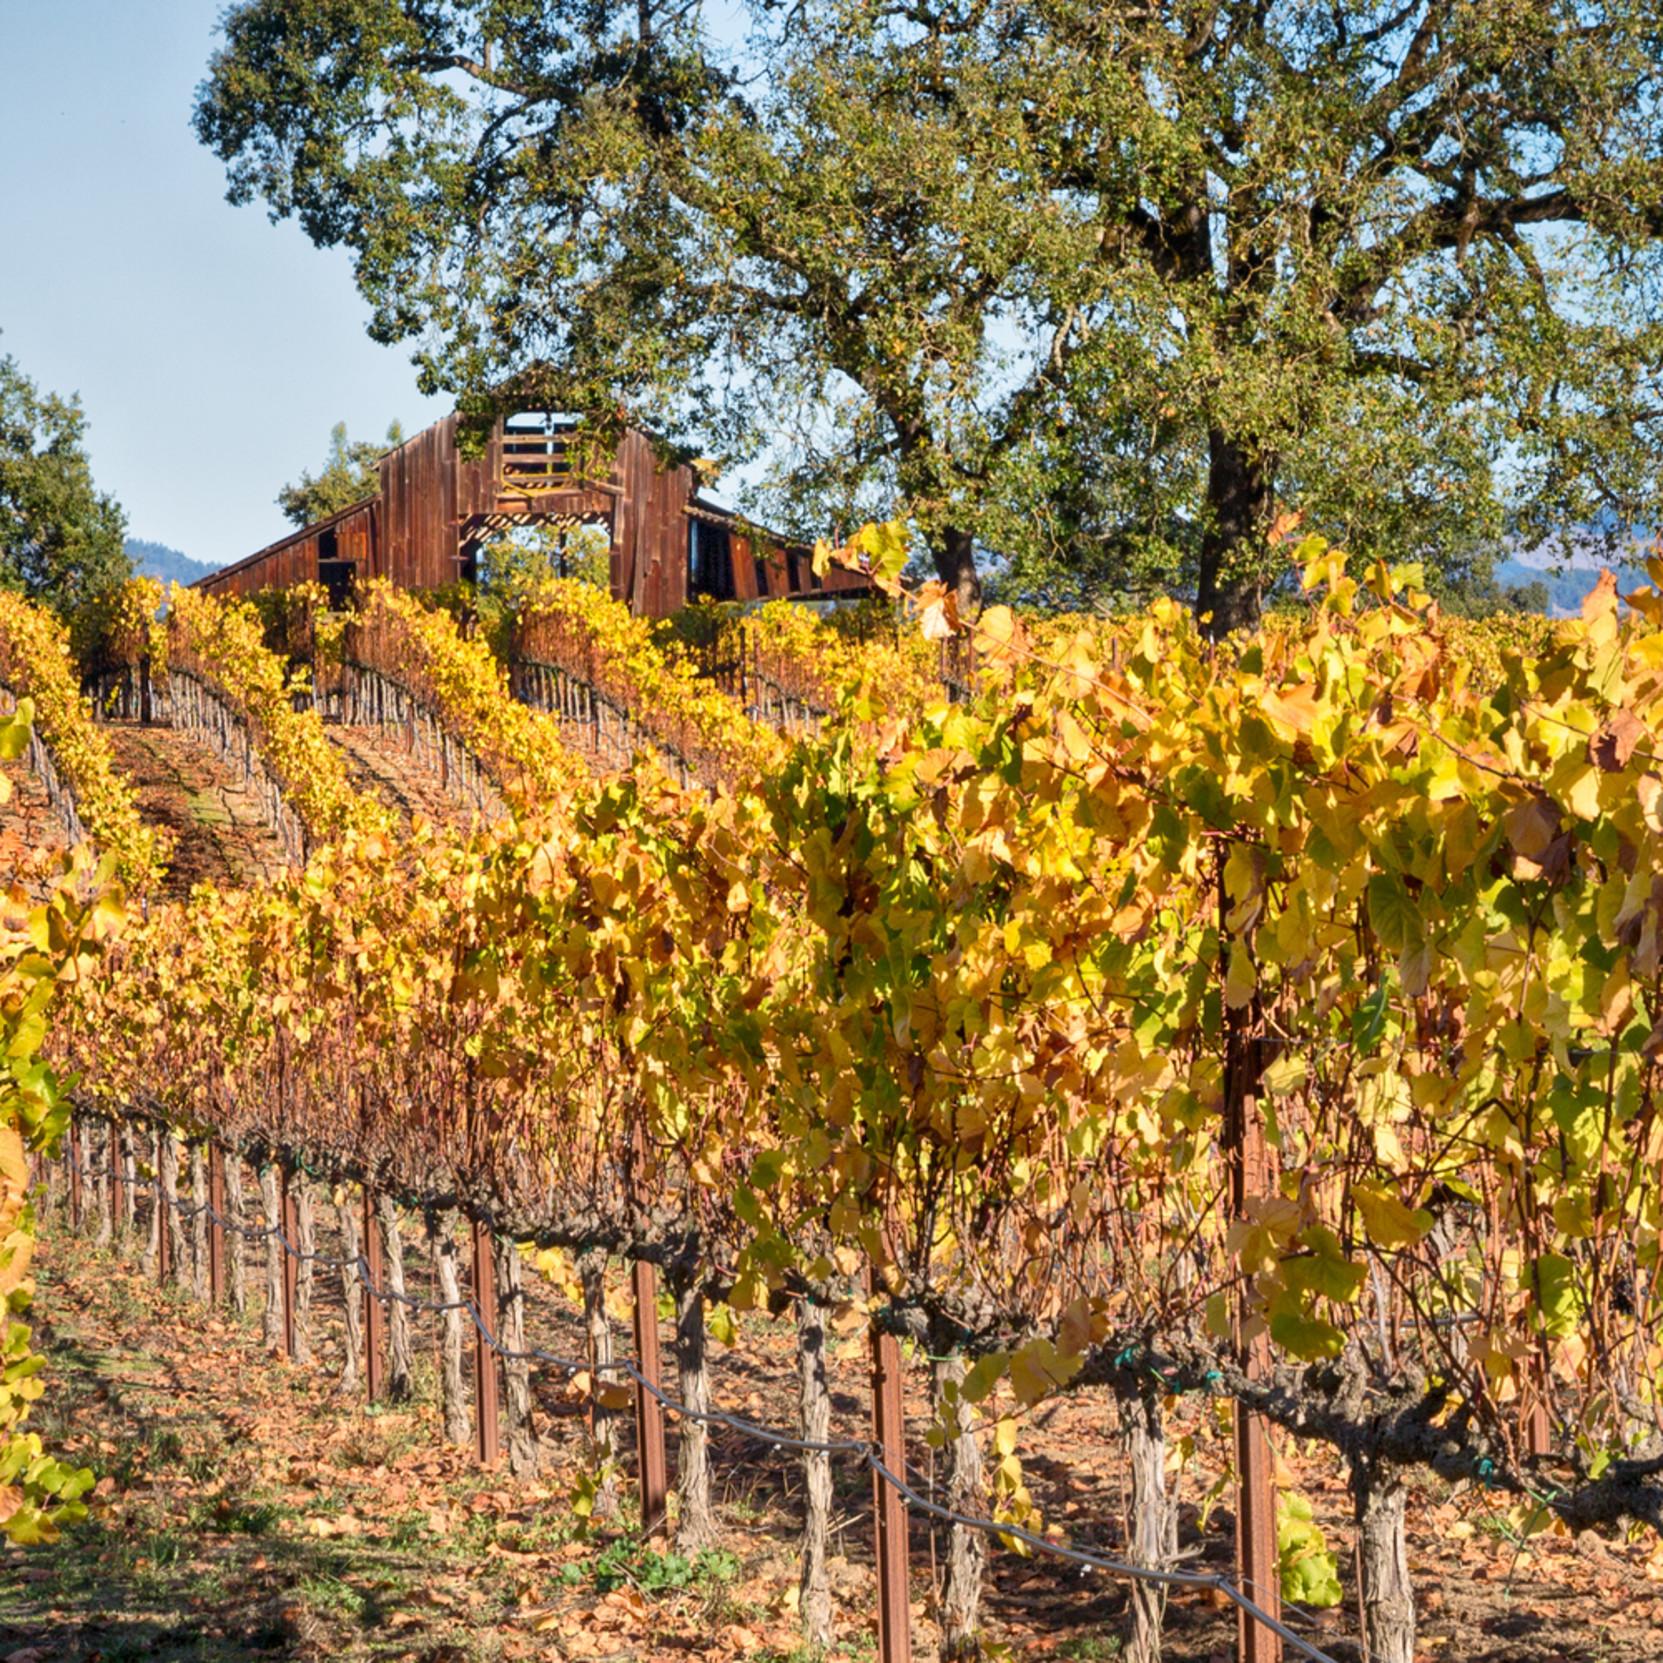 Autumn old vineyard barn nk5msu